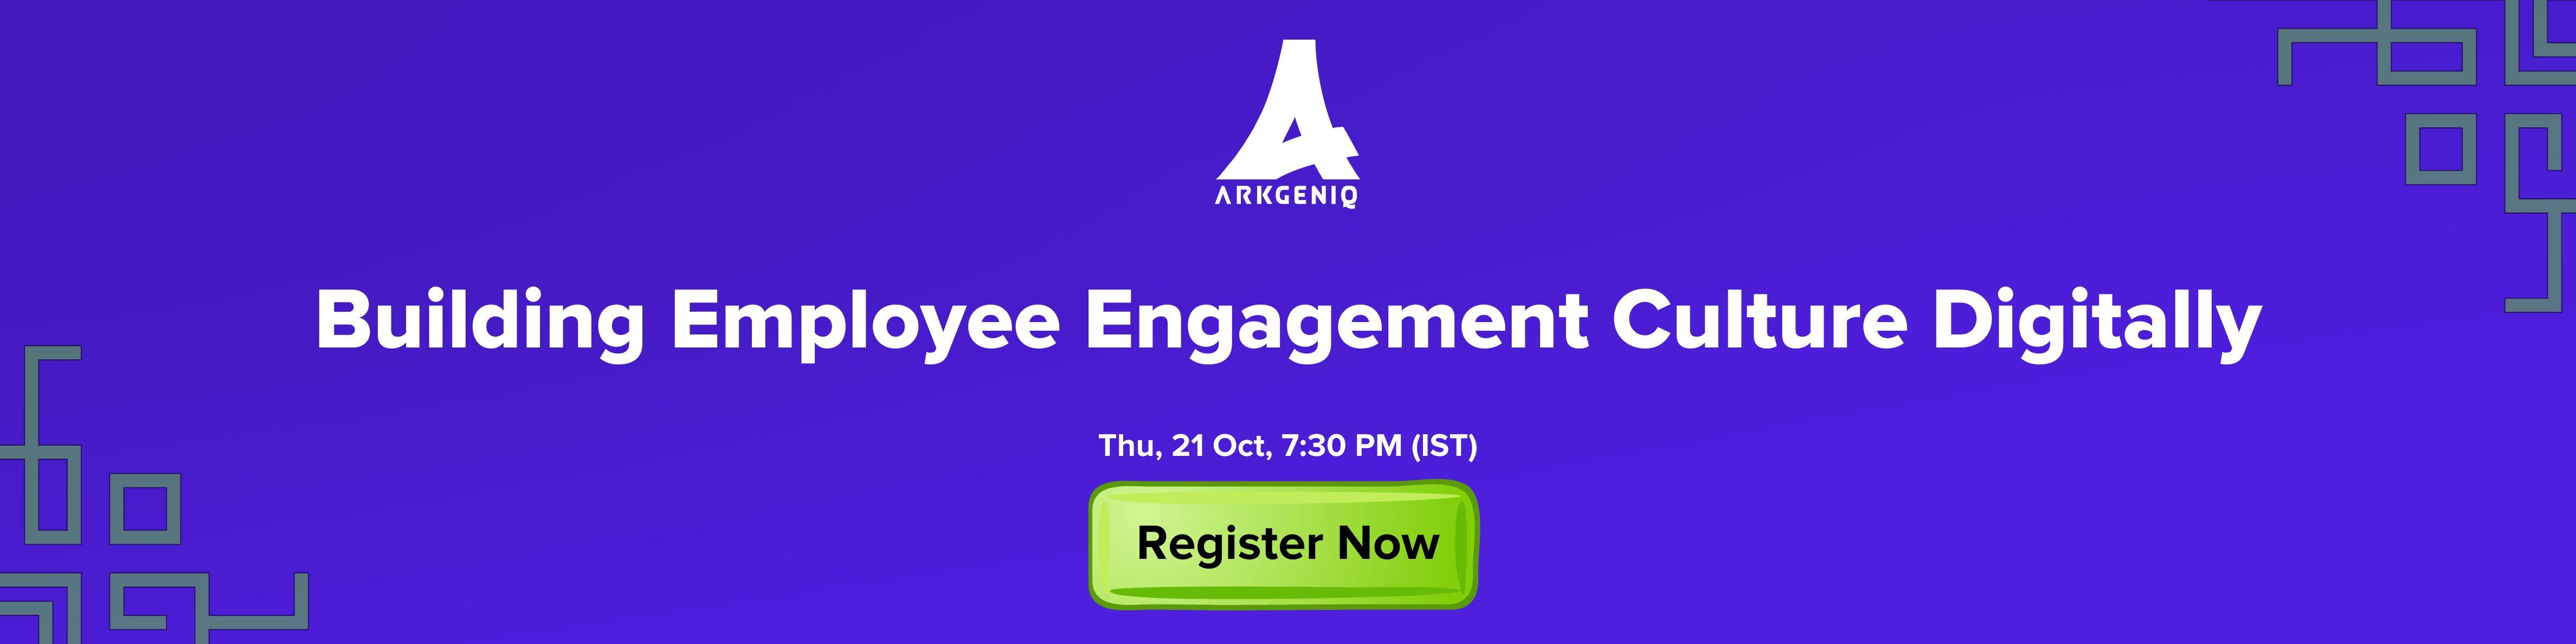 [Webinar] Building Employee Engagement Culture Digitally